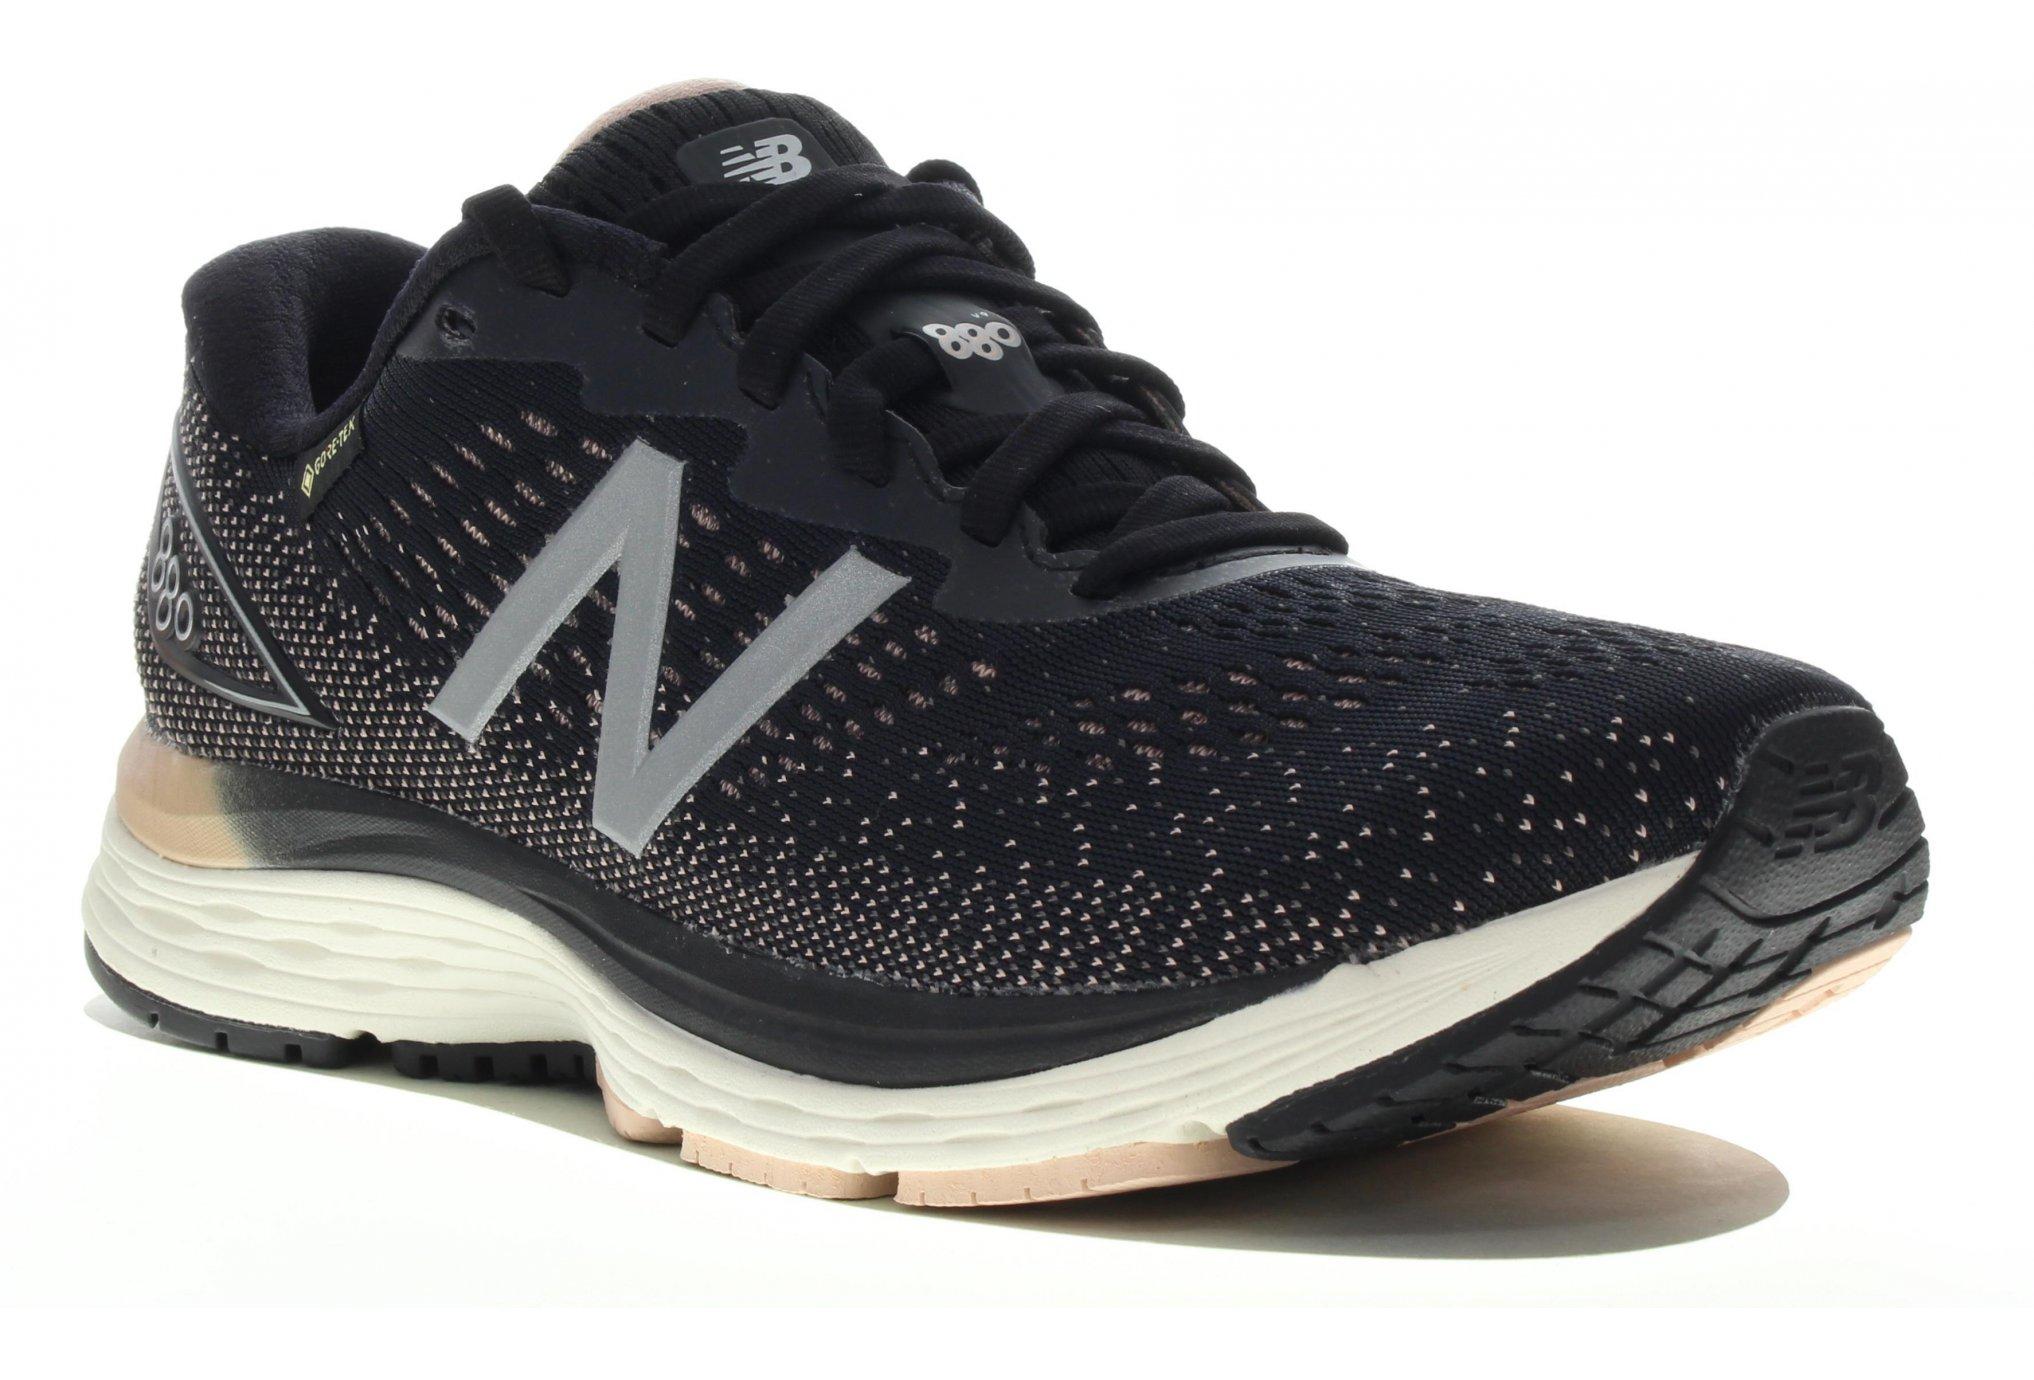 New Balance W 880 V9 Gore-Tex - B Chaussures running femme